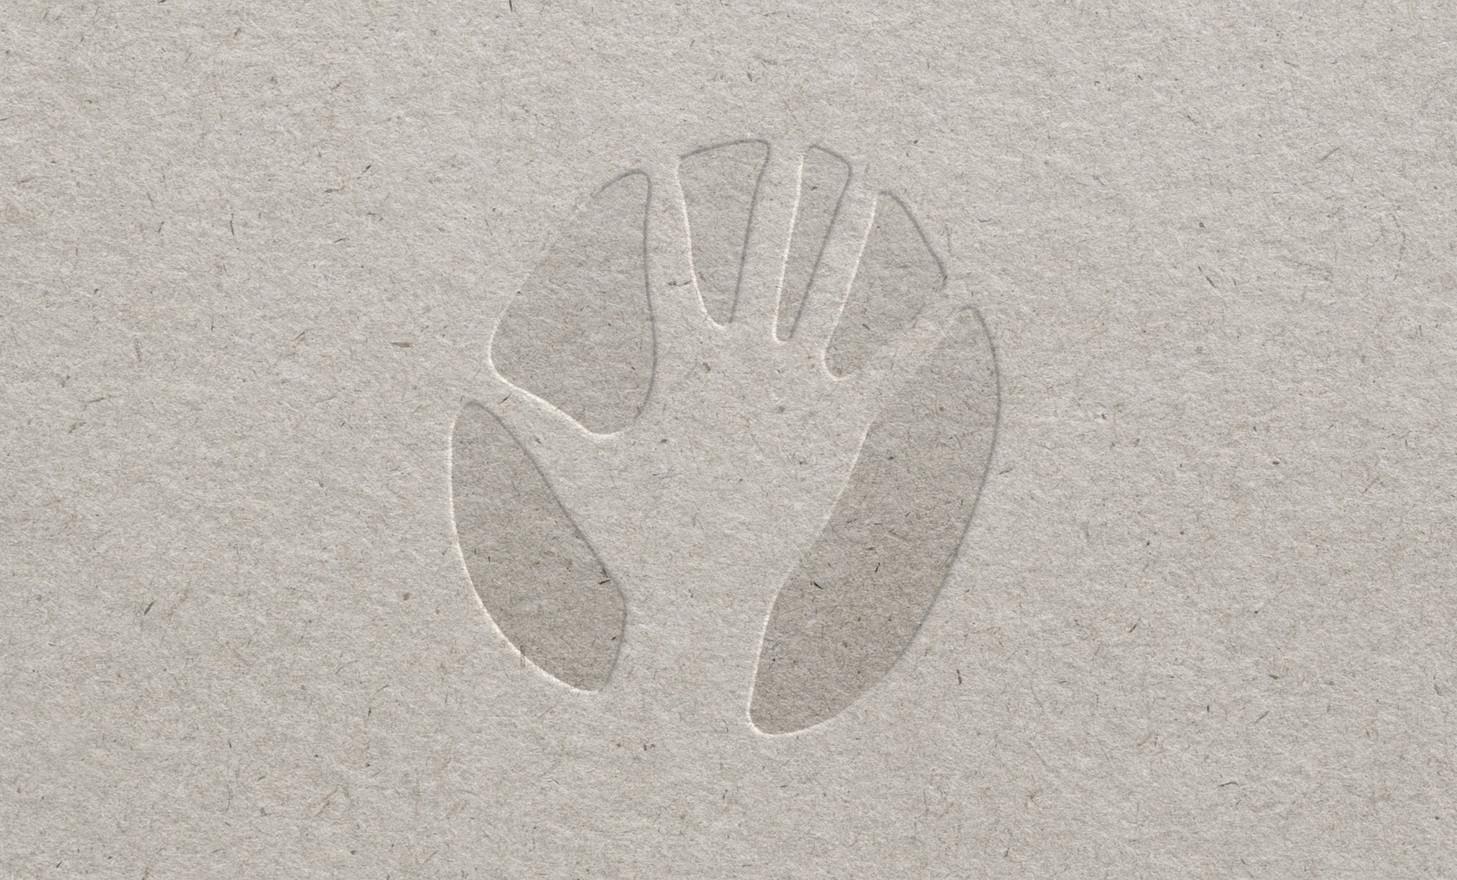 Bodysaga. Logo.